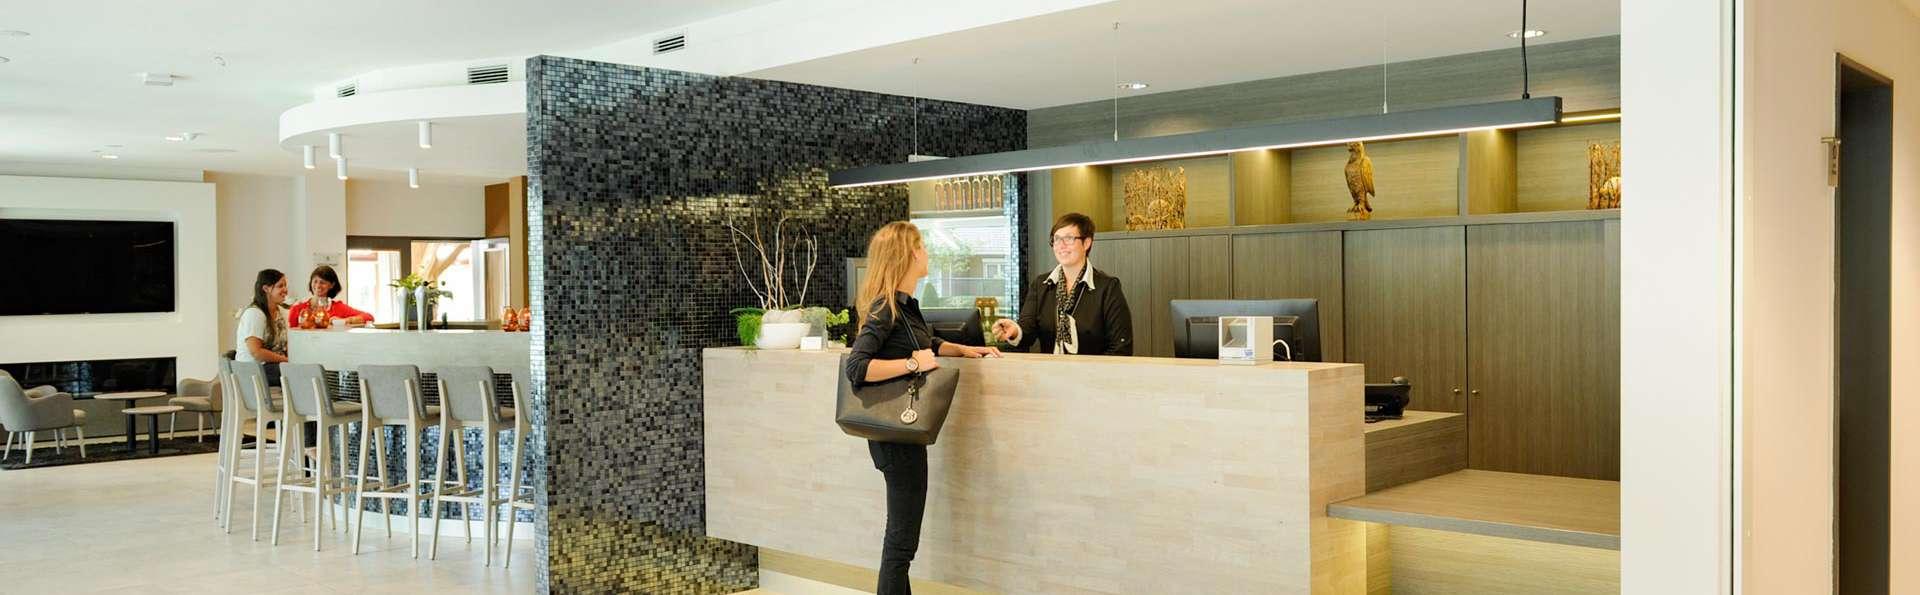 Van der Valk Hotel Dennenhof - EDIT_LOBBY_01.jpg